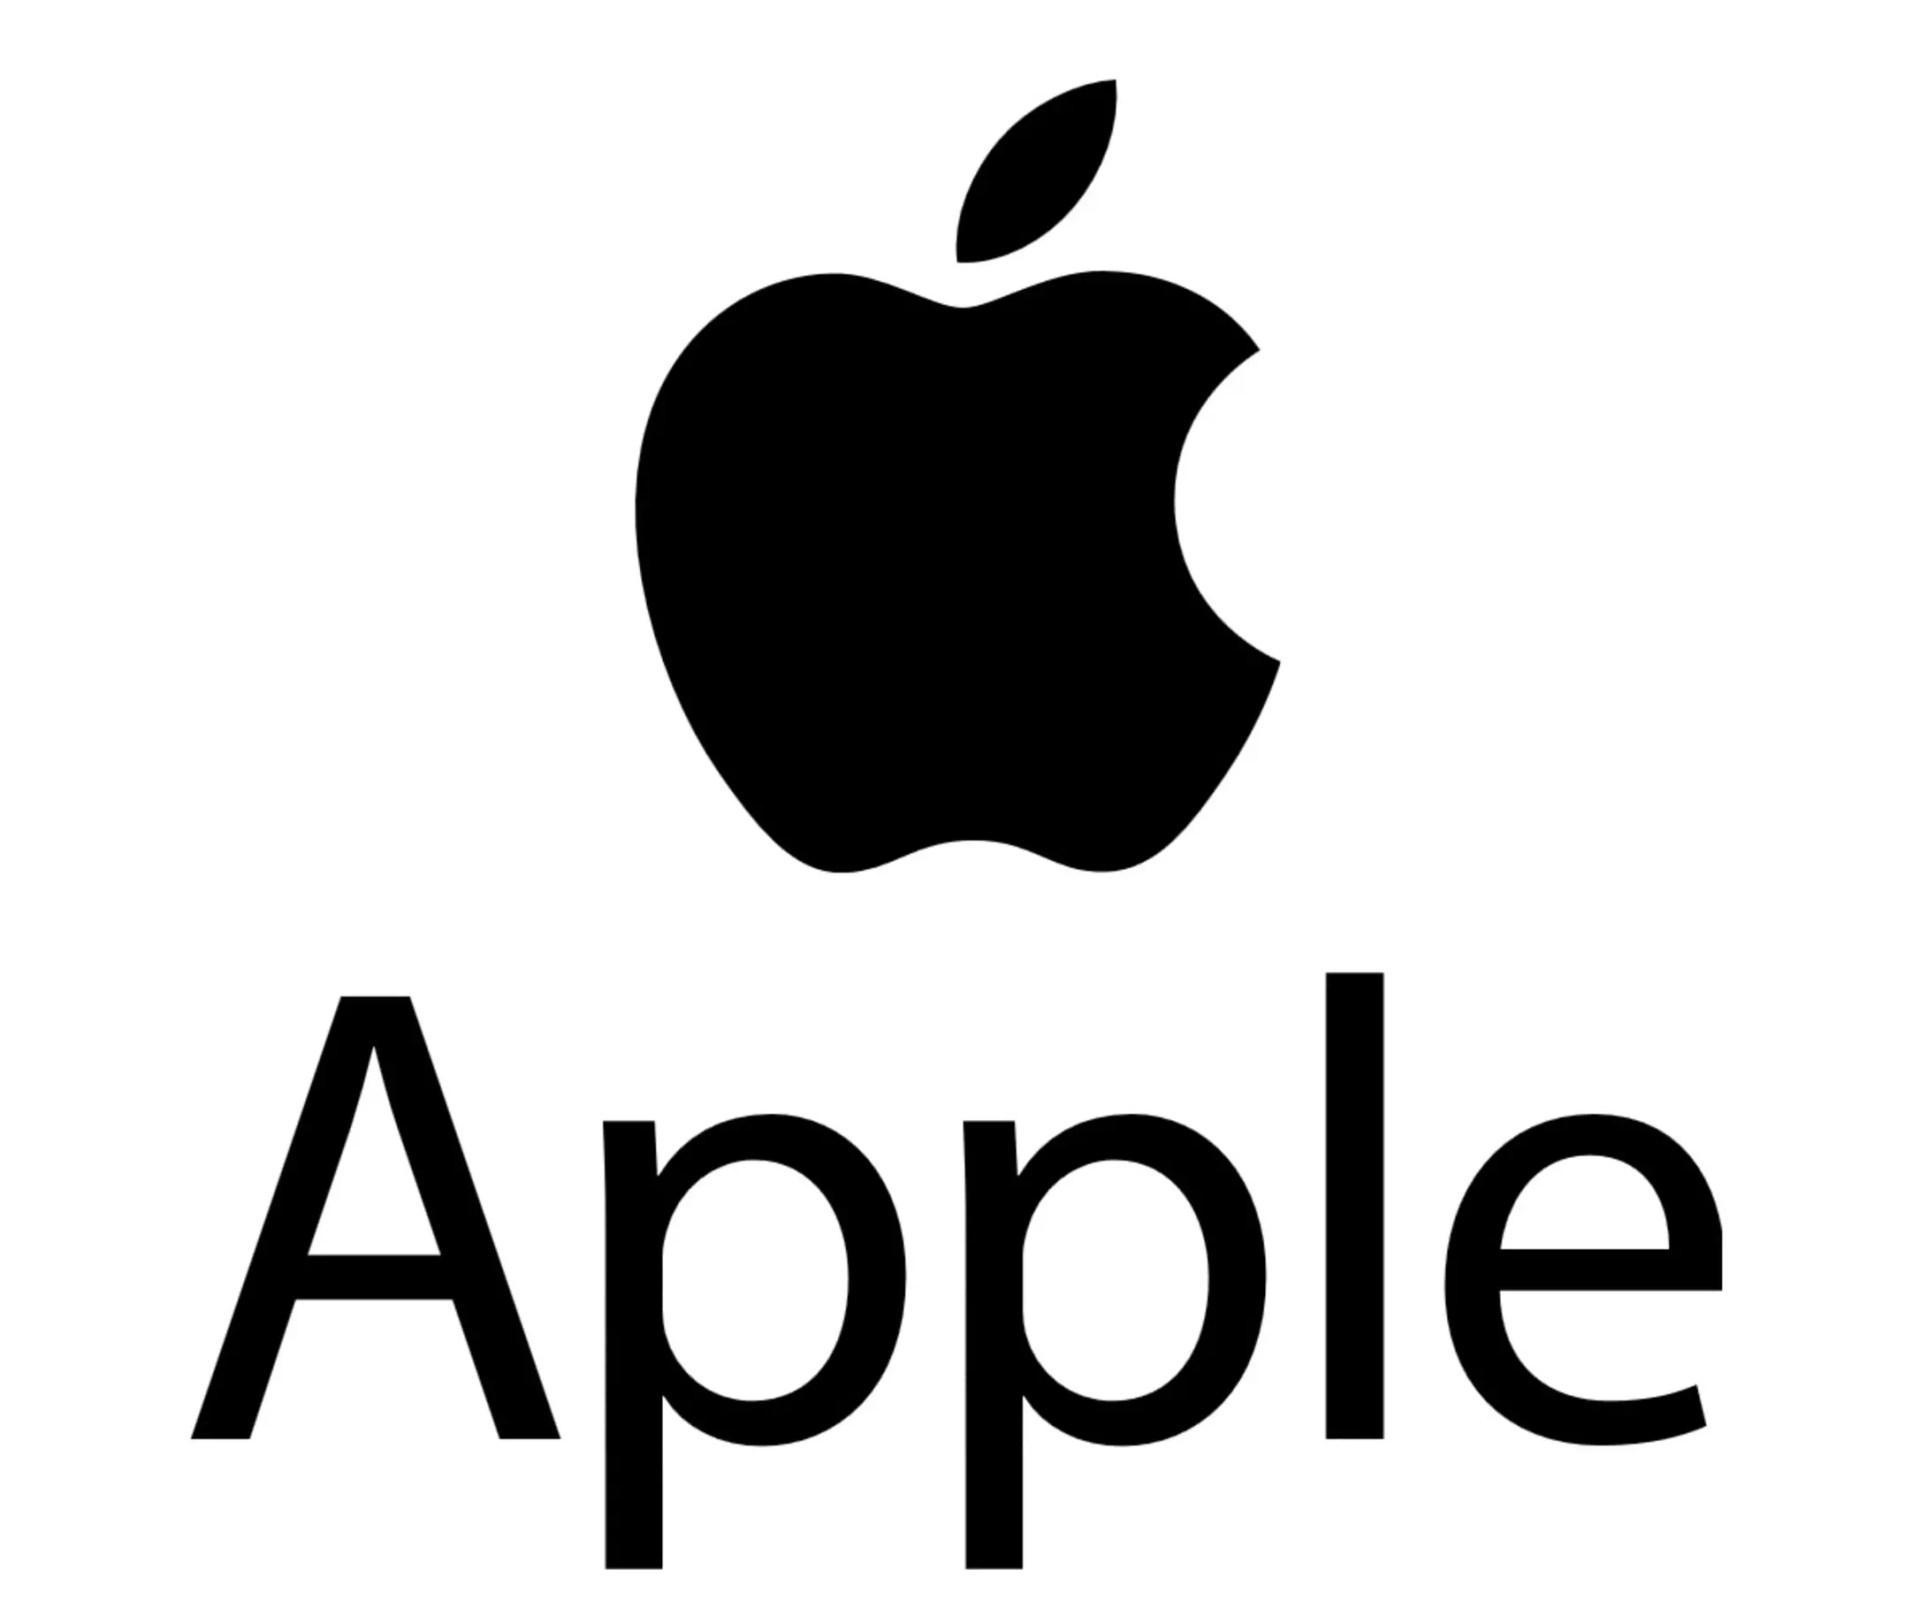 Appleのロゴ商標指定区分が増加、更にあんな分野に進出も?   小龍茶館